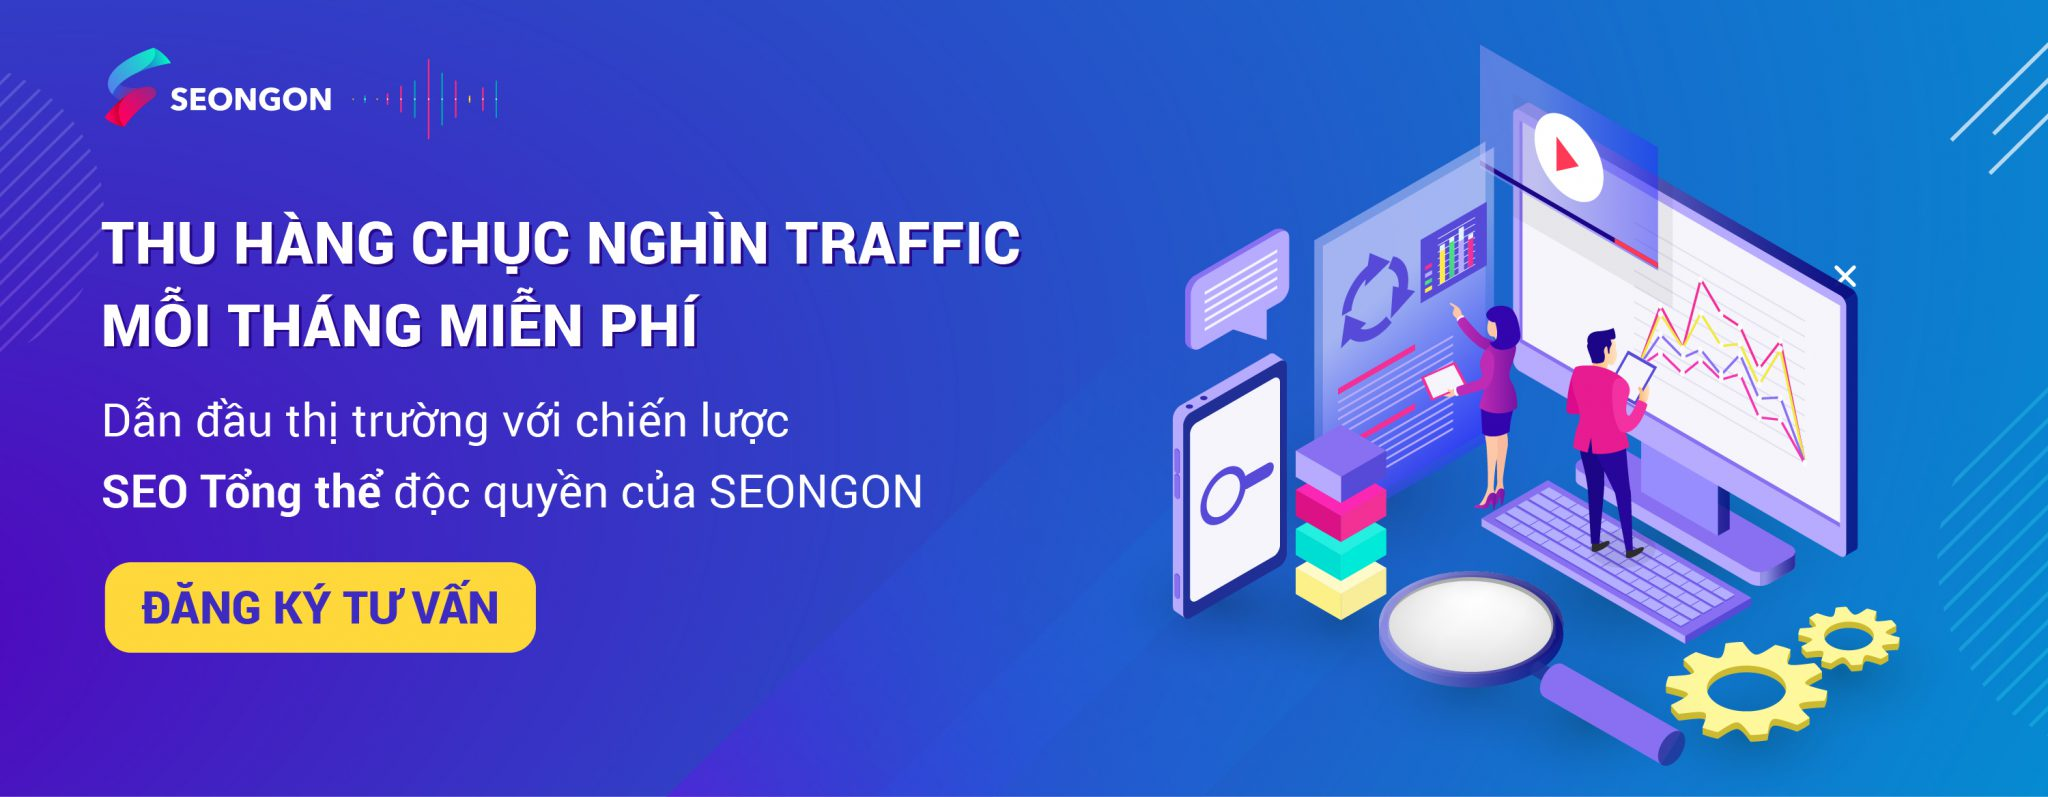 dịch vụ seo seongon